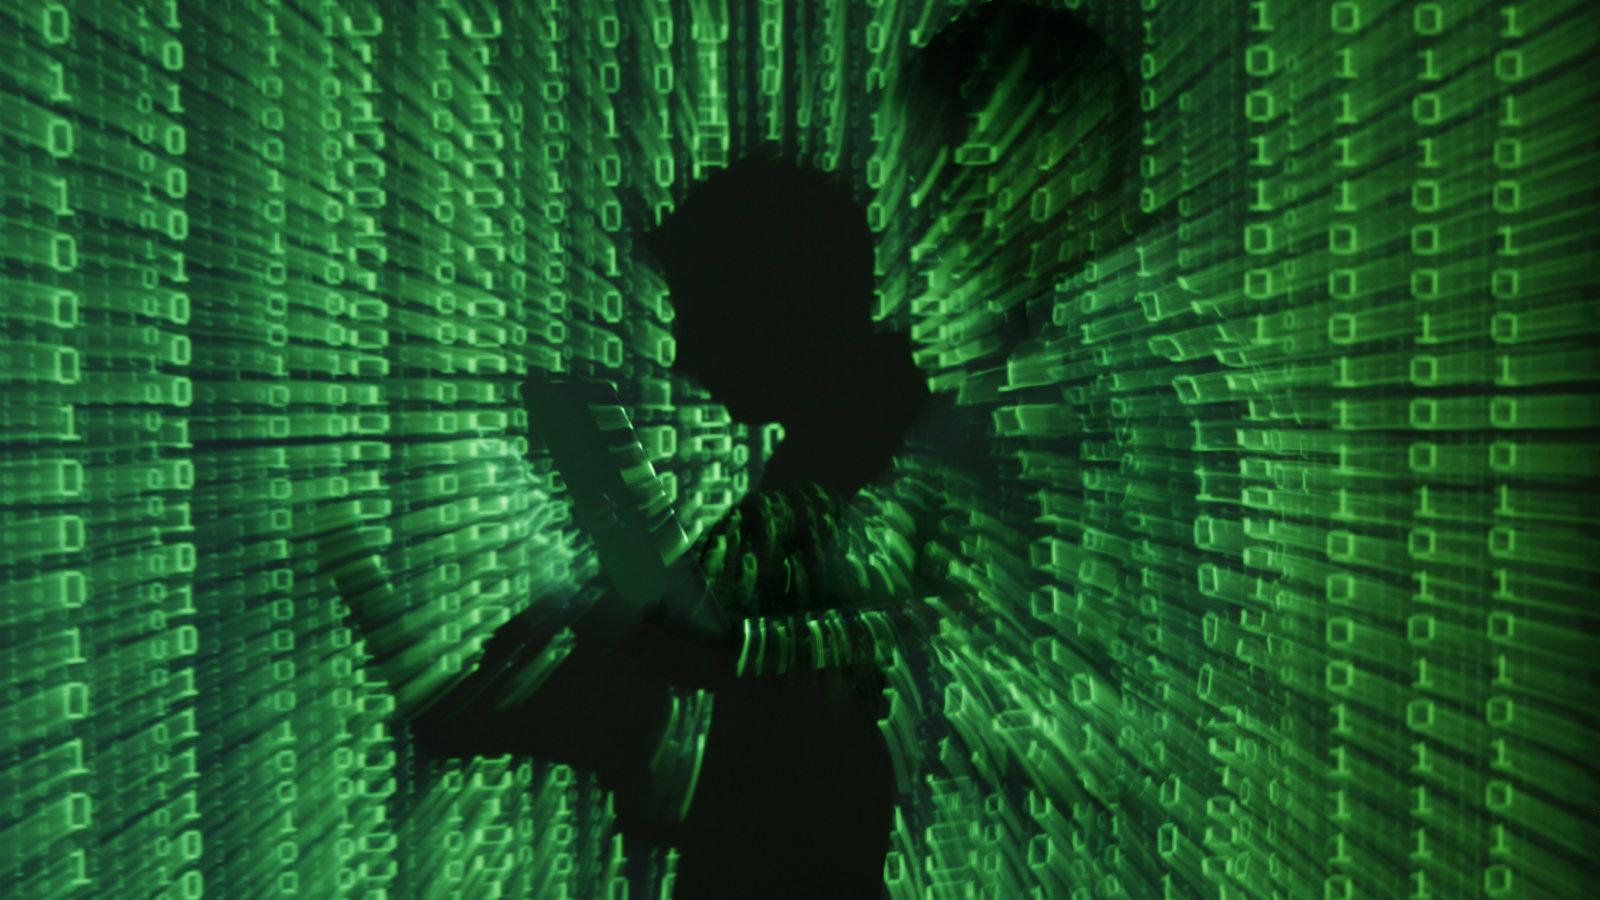 EPFO subscribers' data hacked